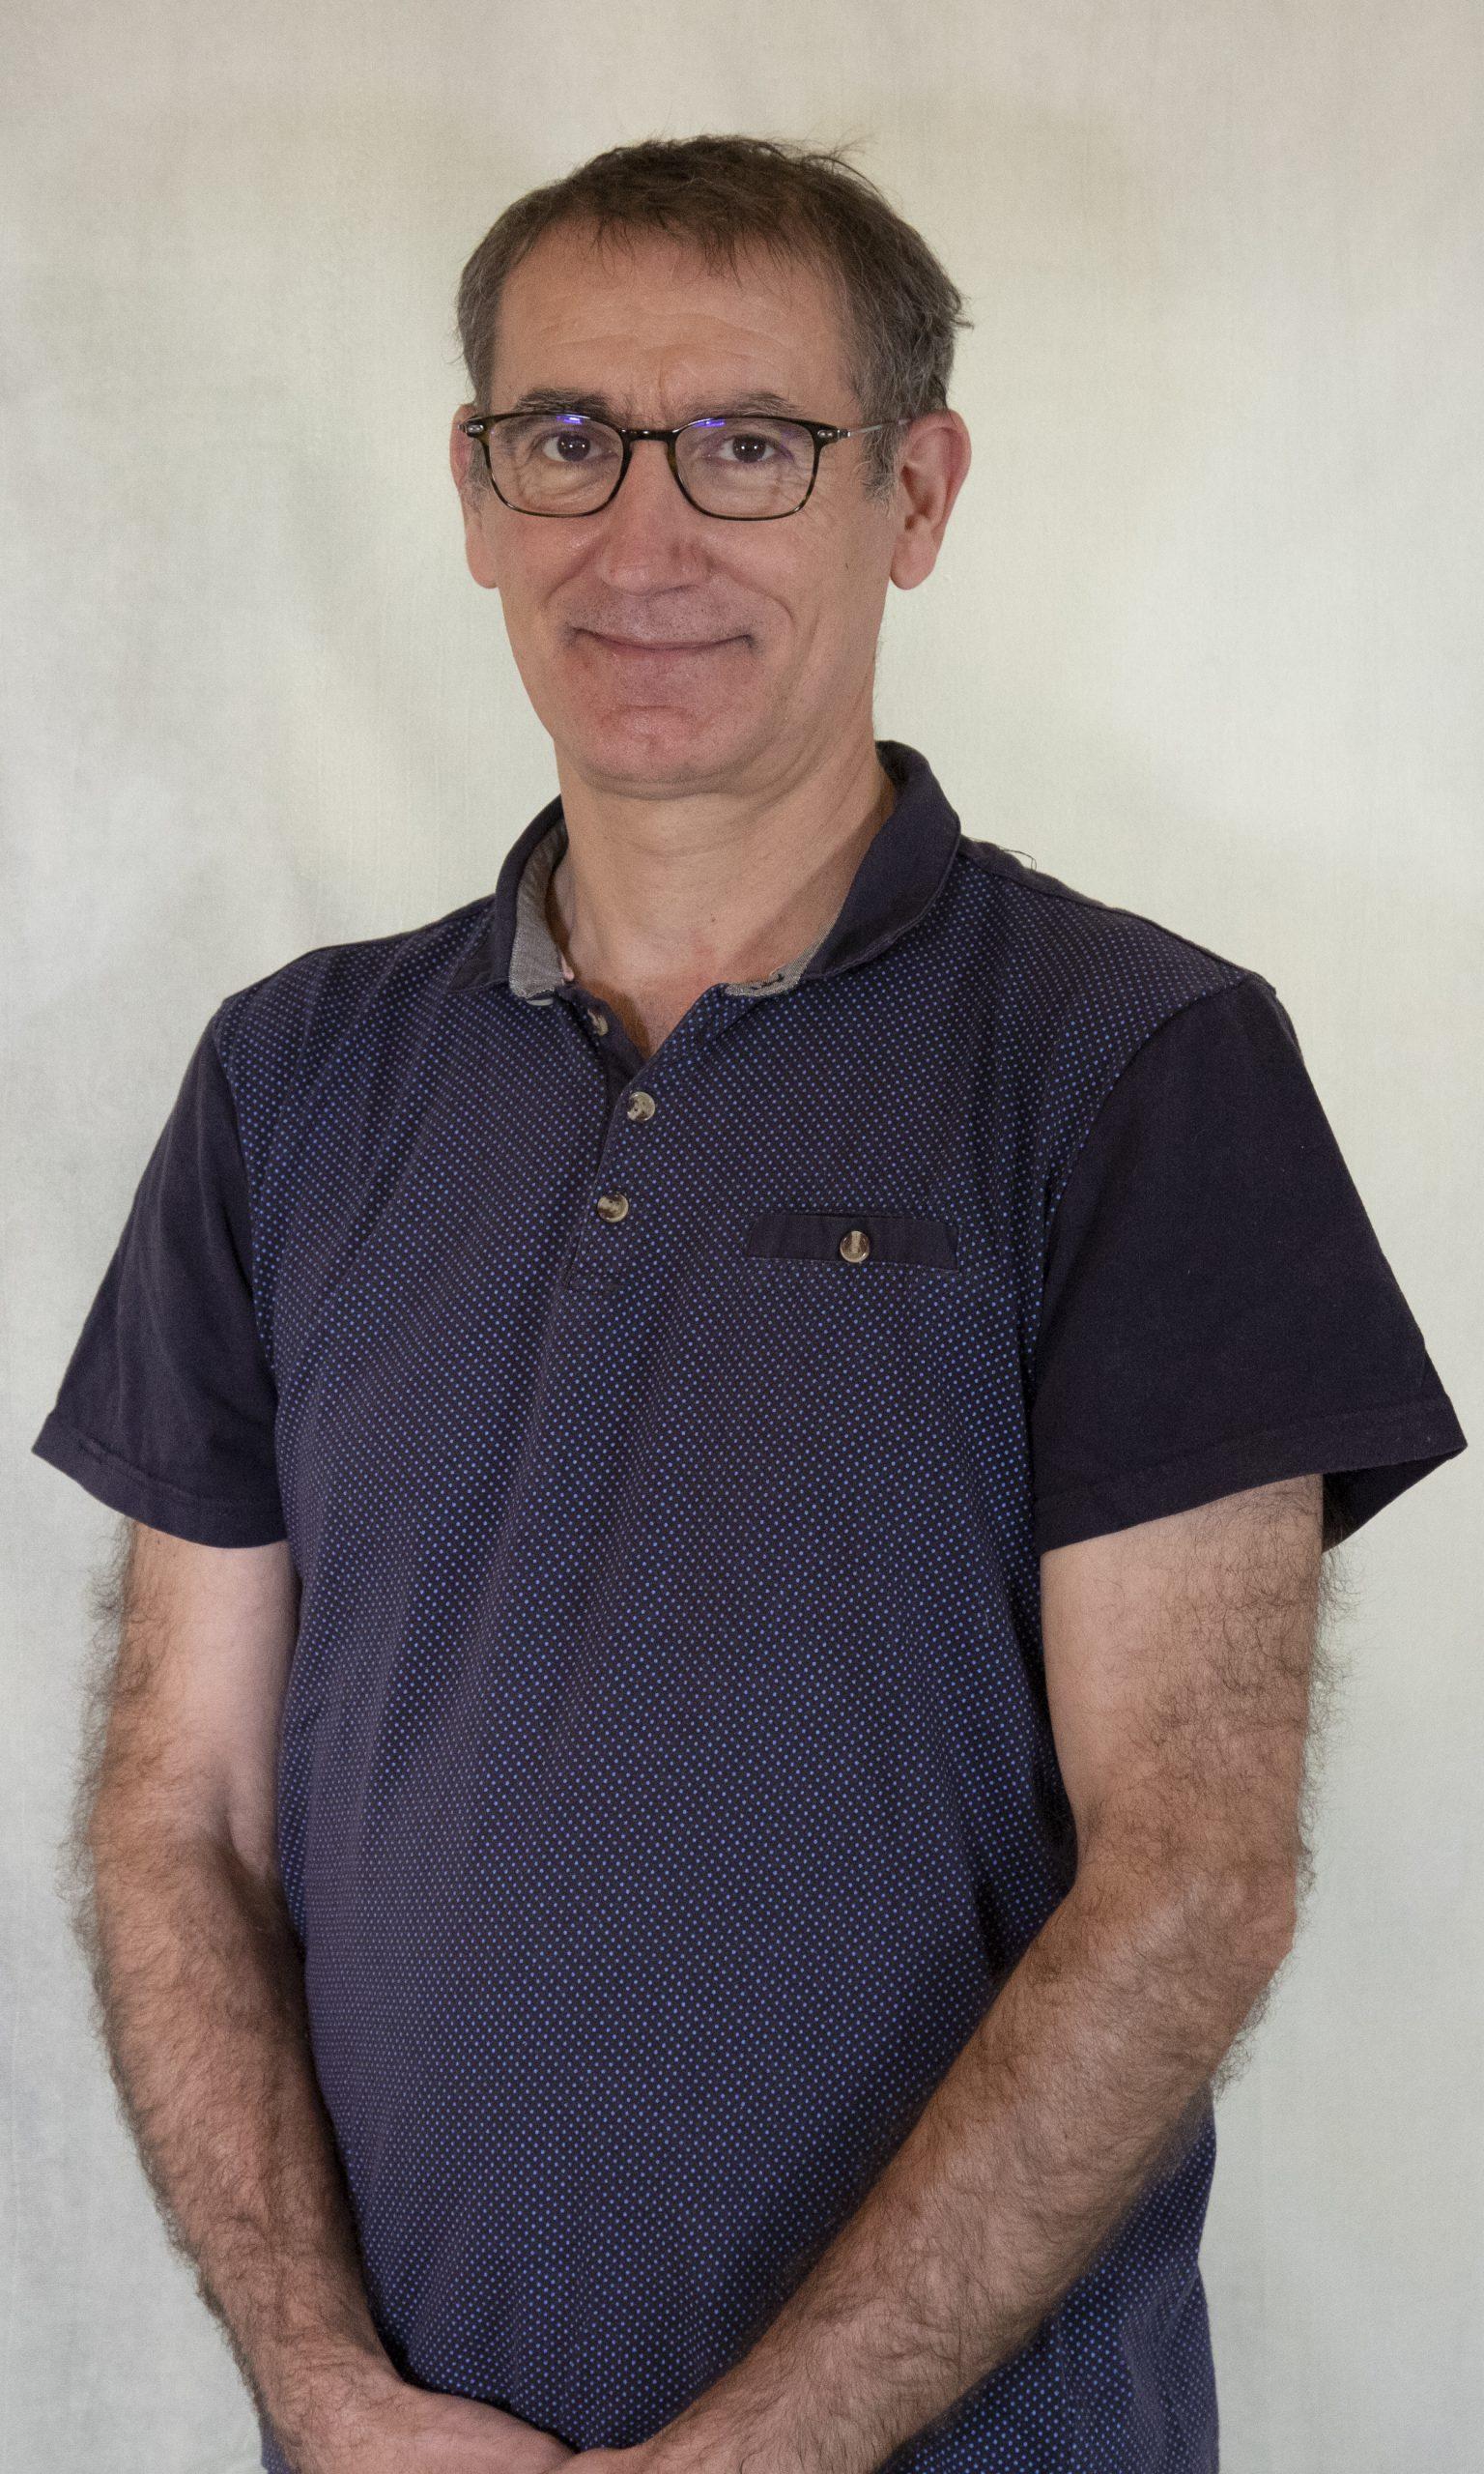 Marc Cornuot